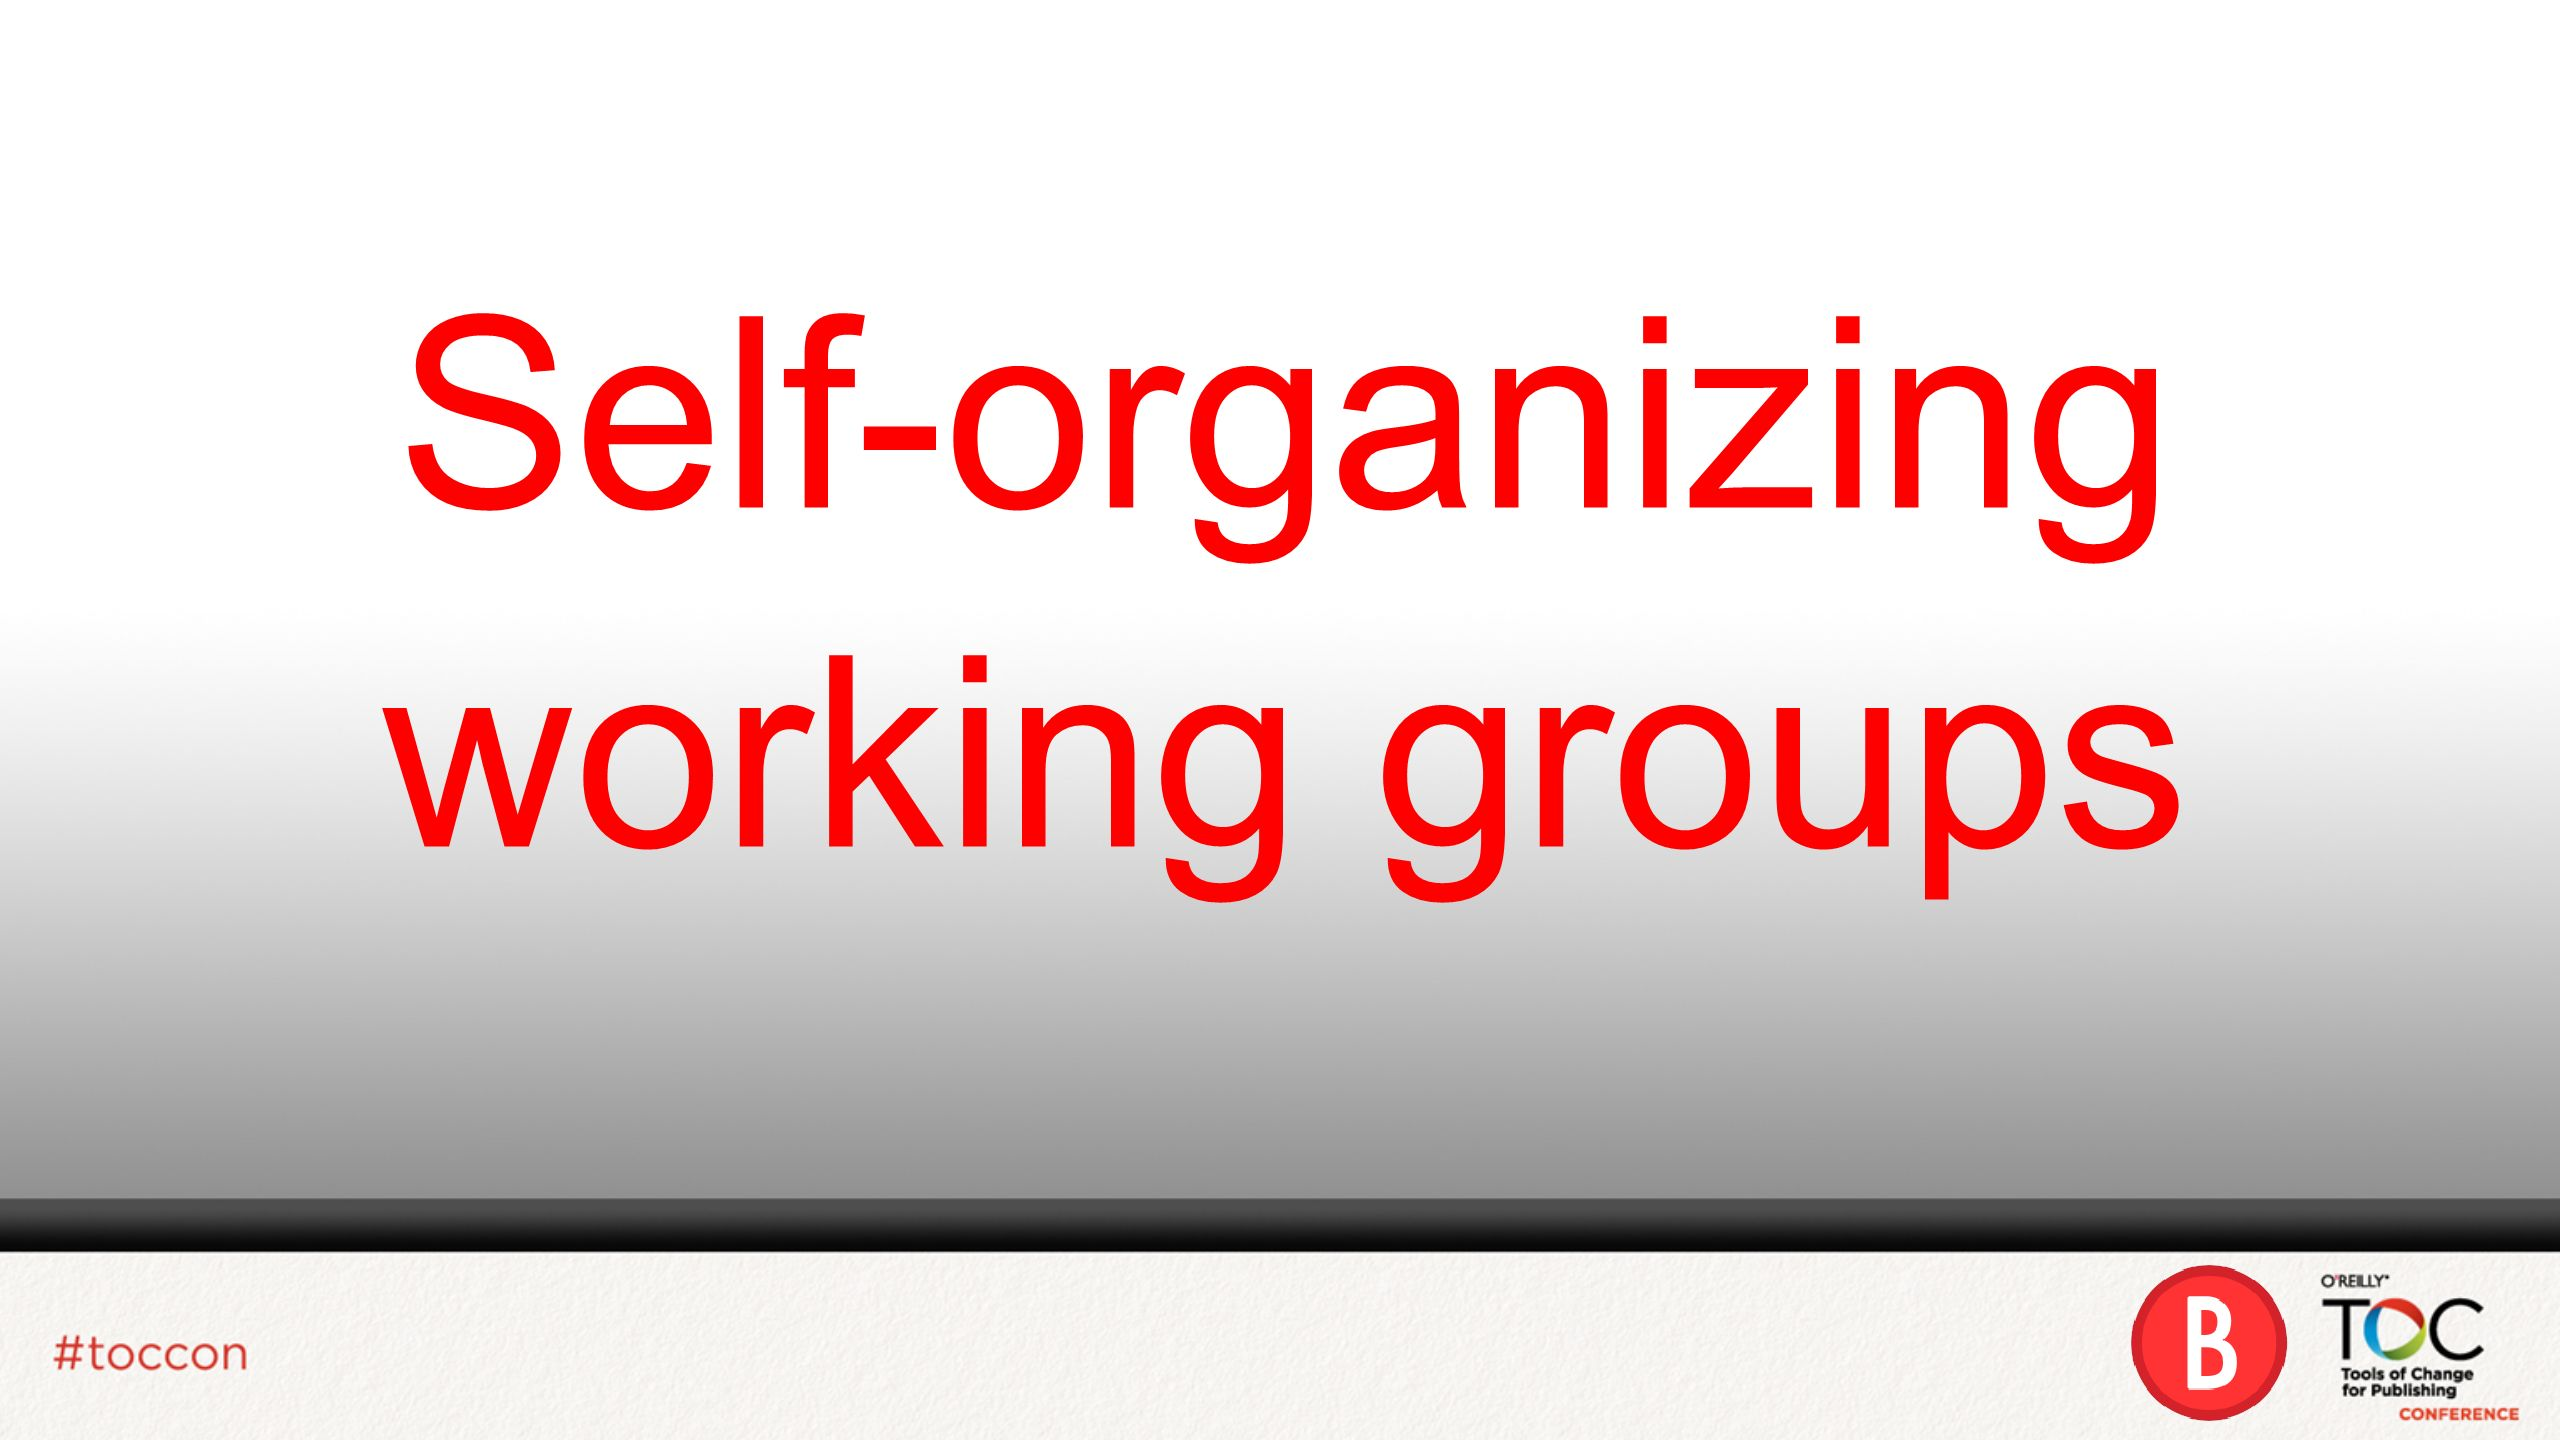 Self-organizing working groups